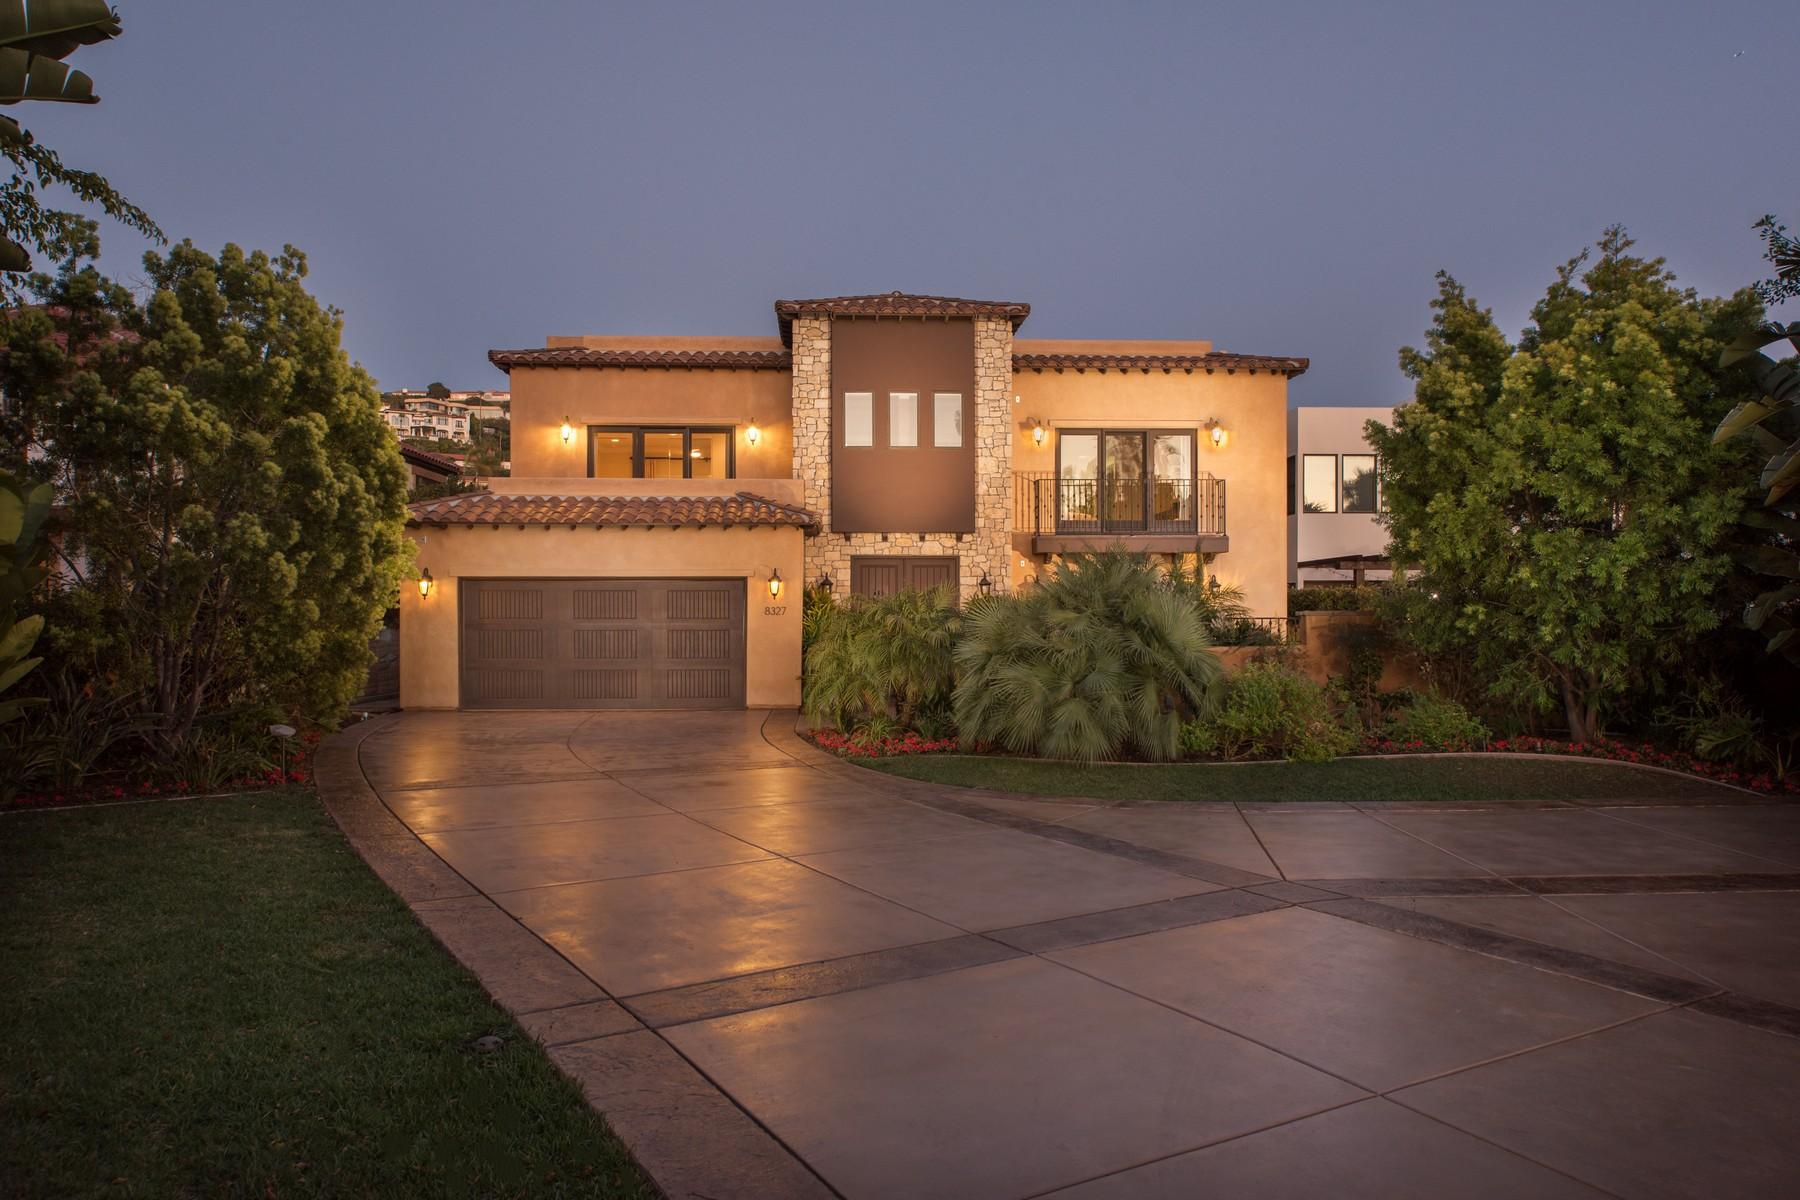 Additional photo for property listing at 8327 La Jolla Shores Drive  拉荷亚, 加利福尼亚州 92037 美国